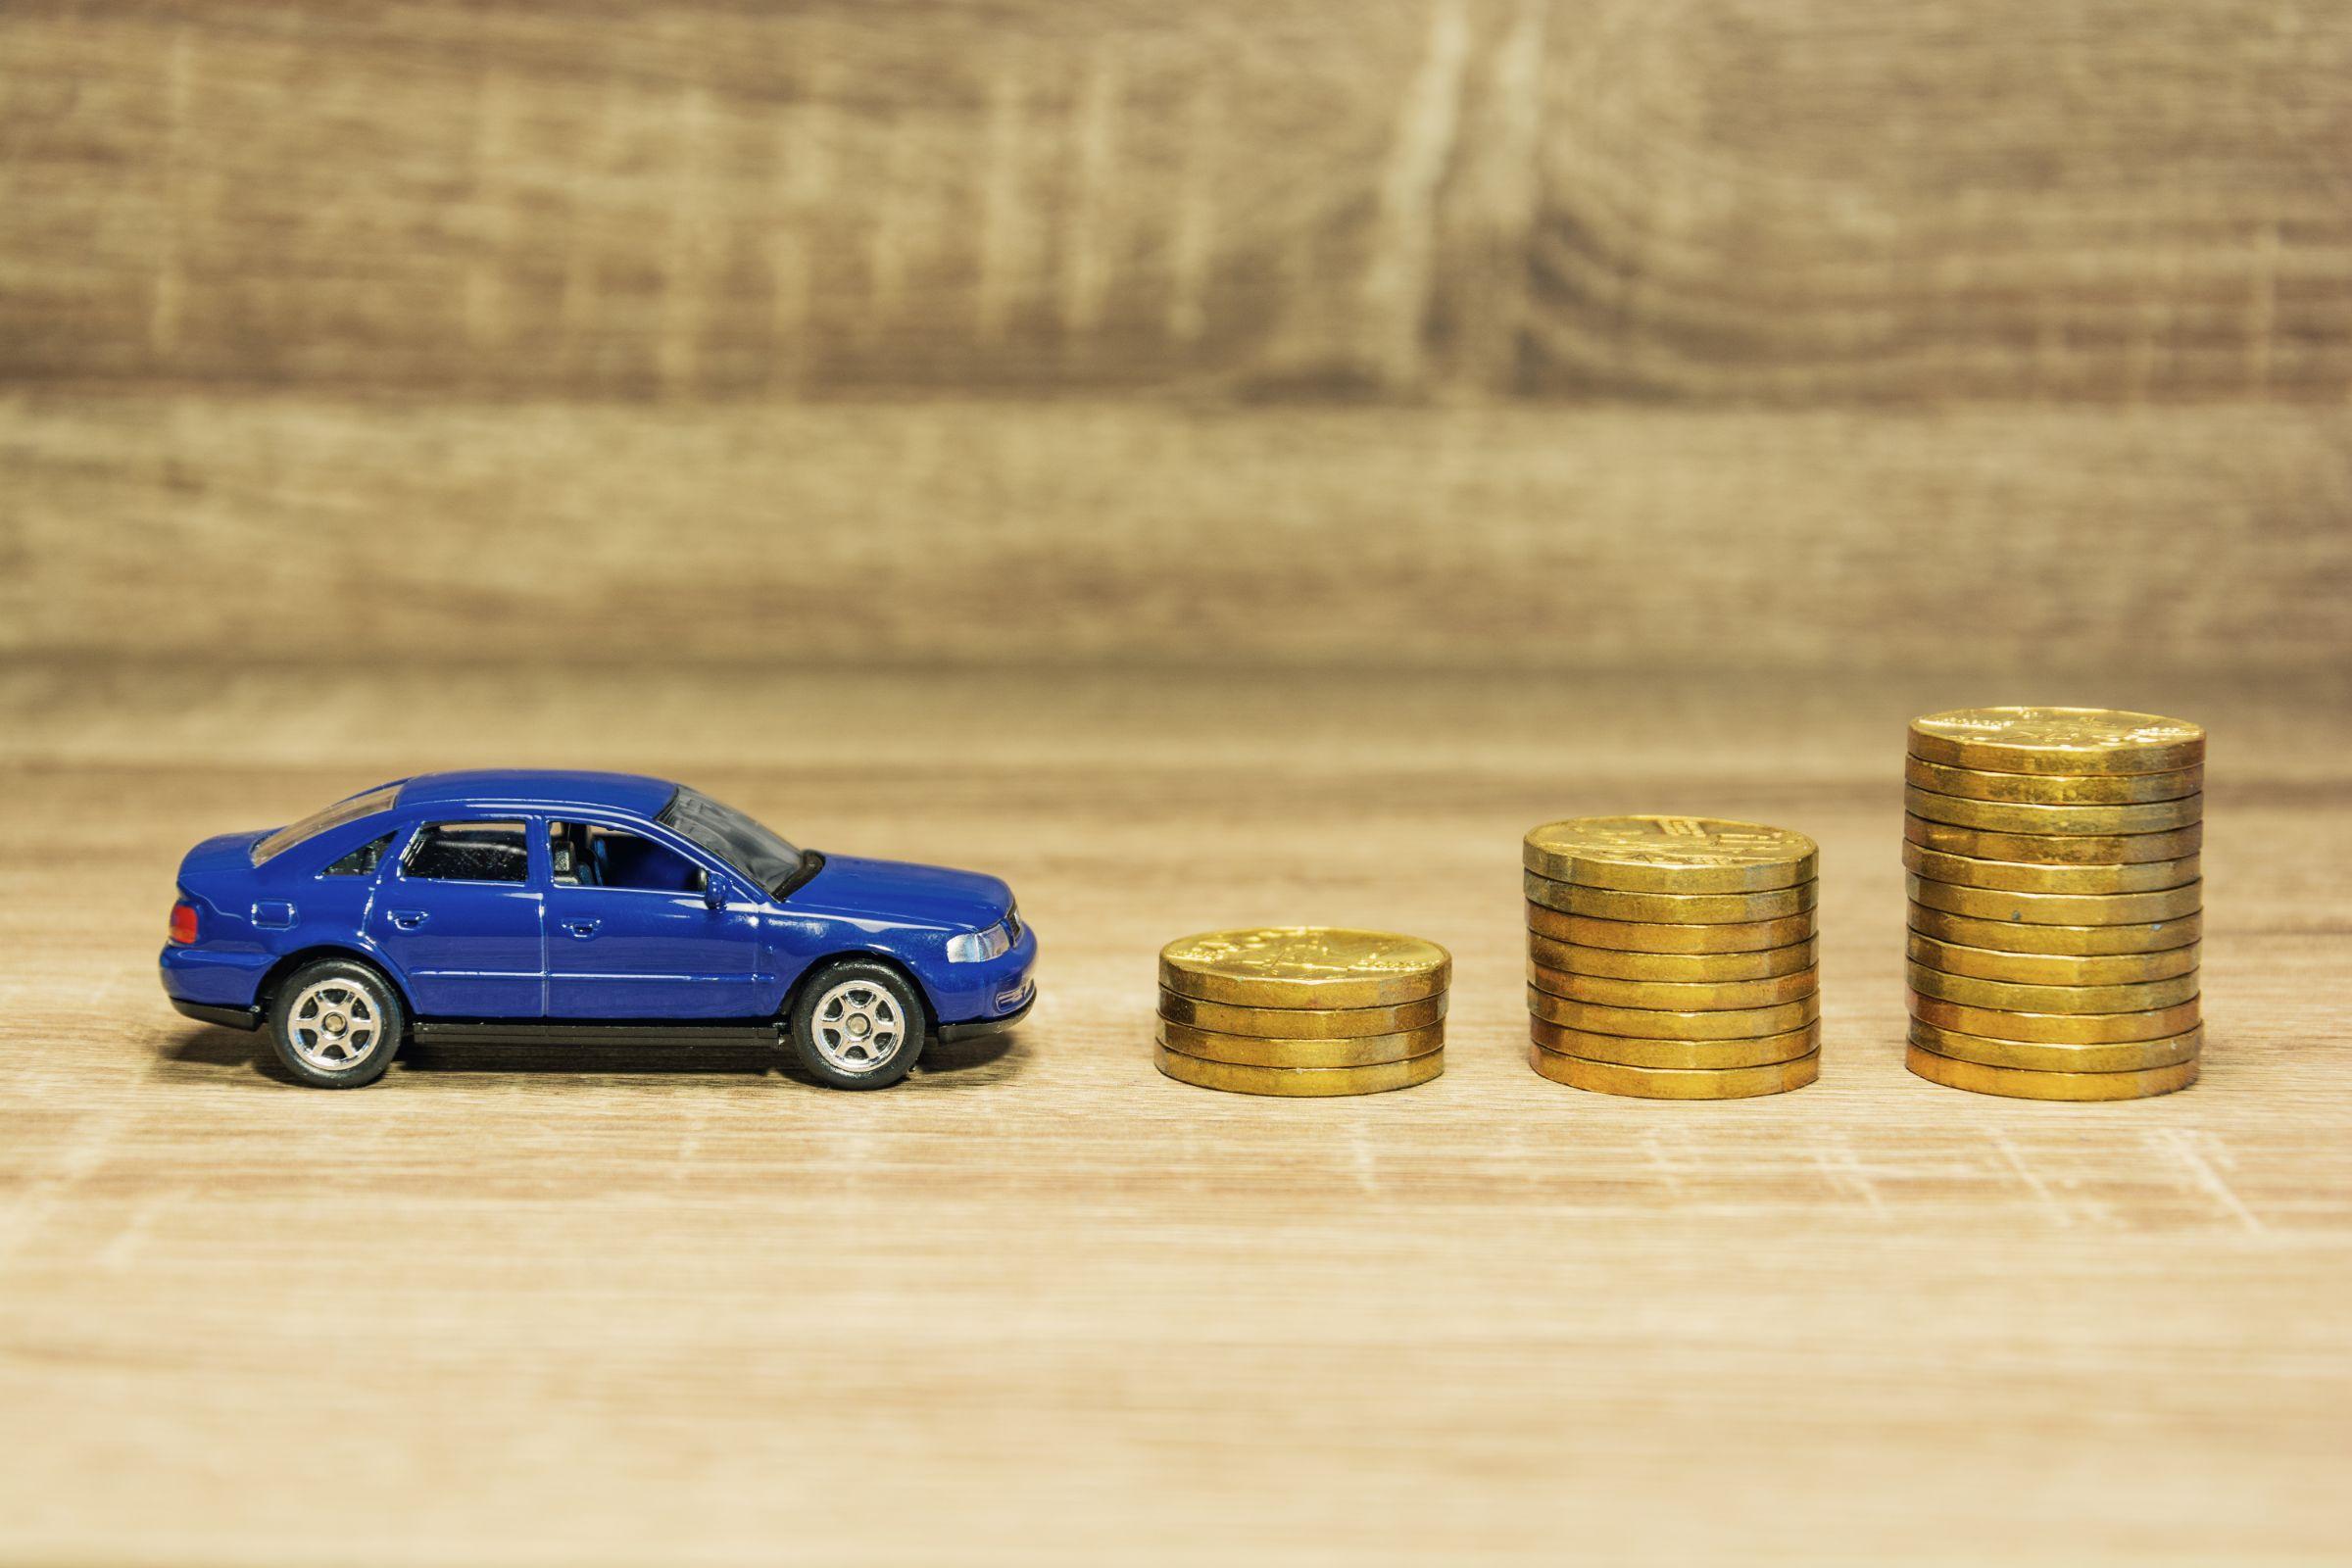 shutterstock consorcio financiamento contas